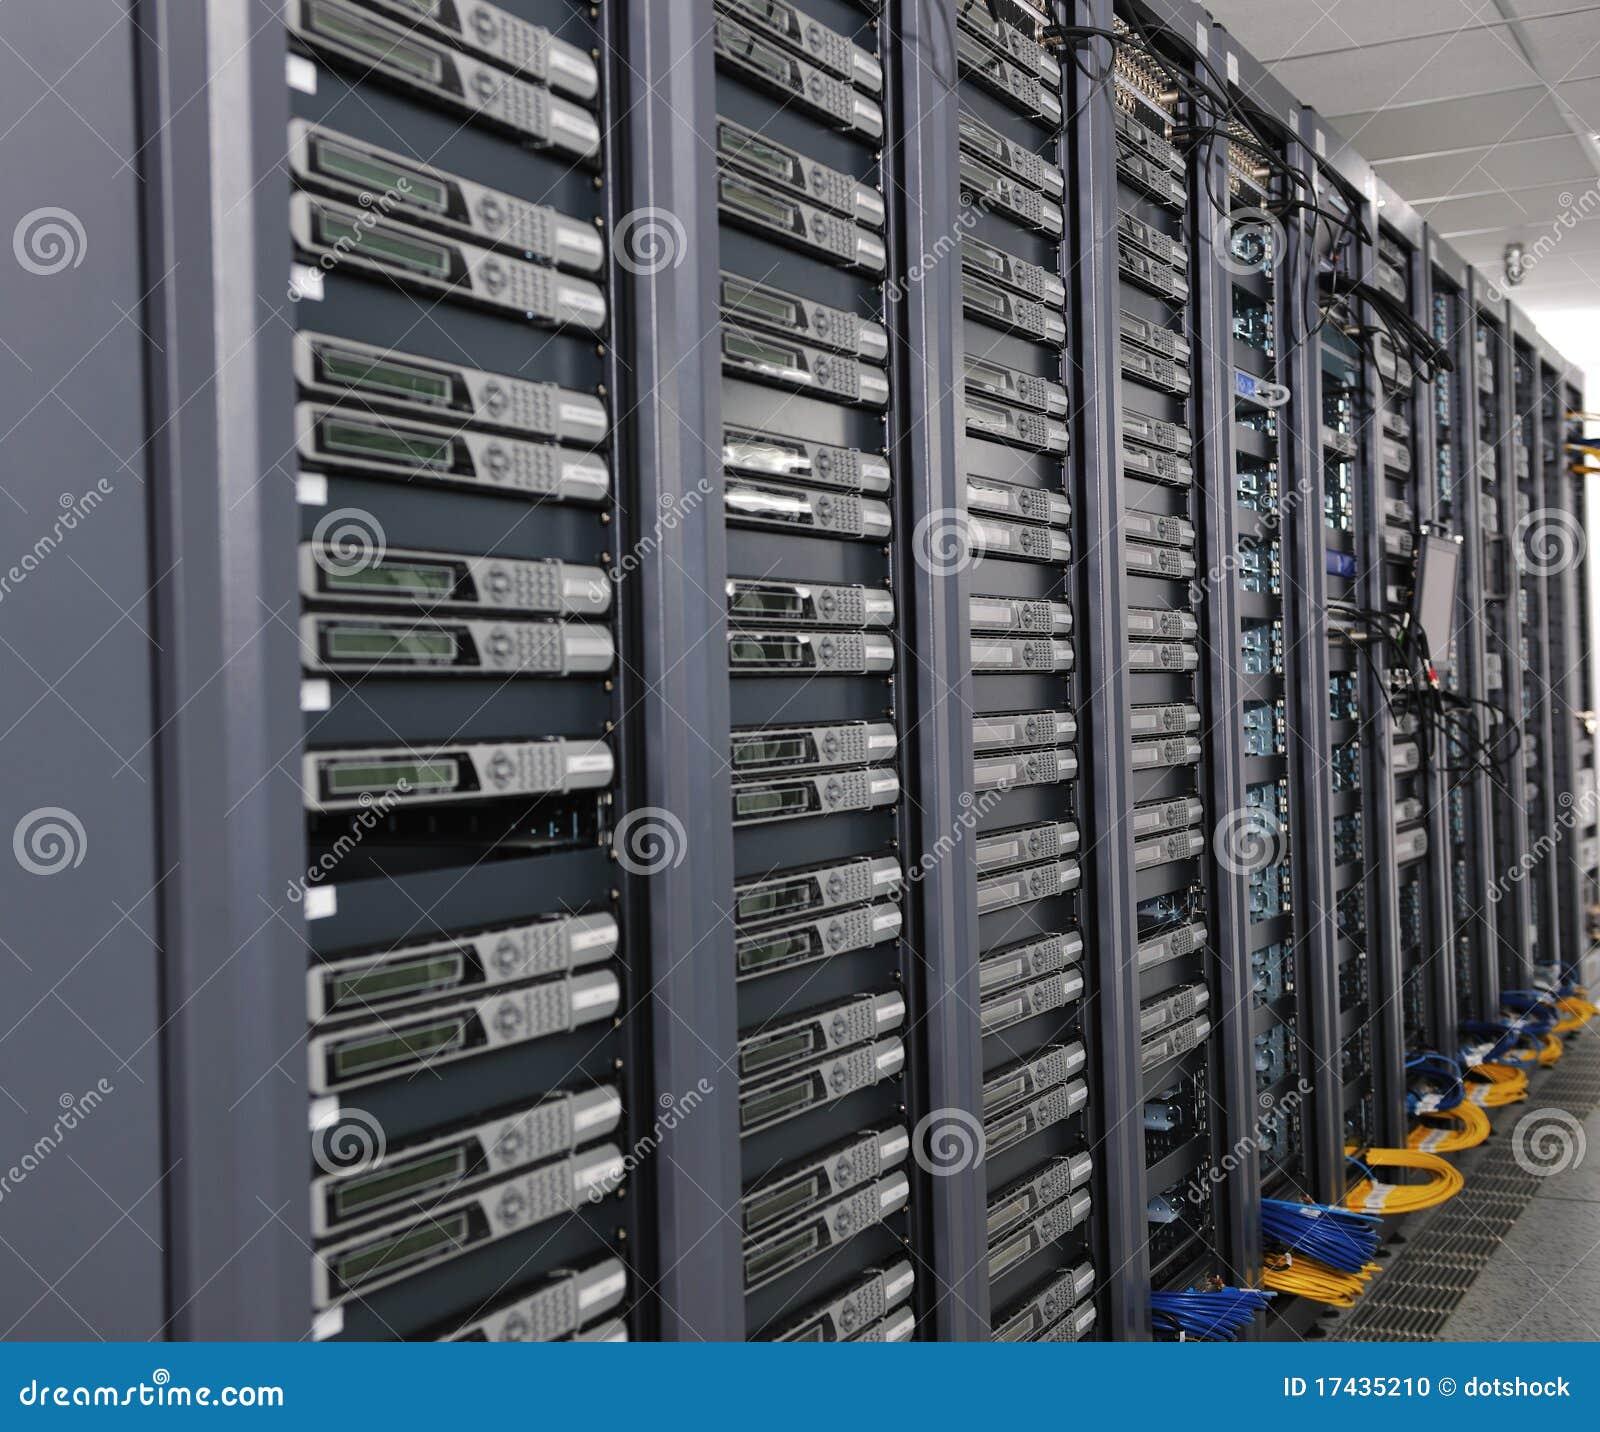 Network Server Room Stock Photo Image 17435210